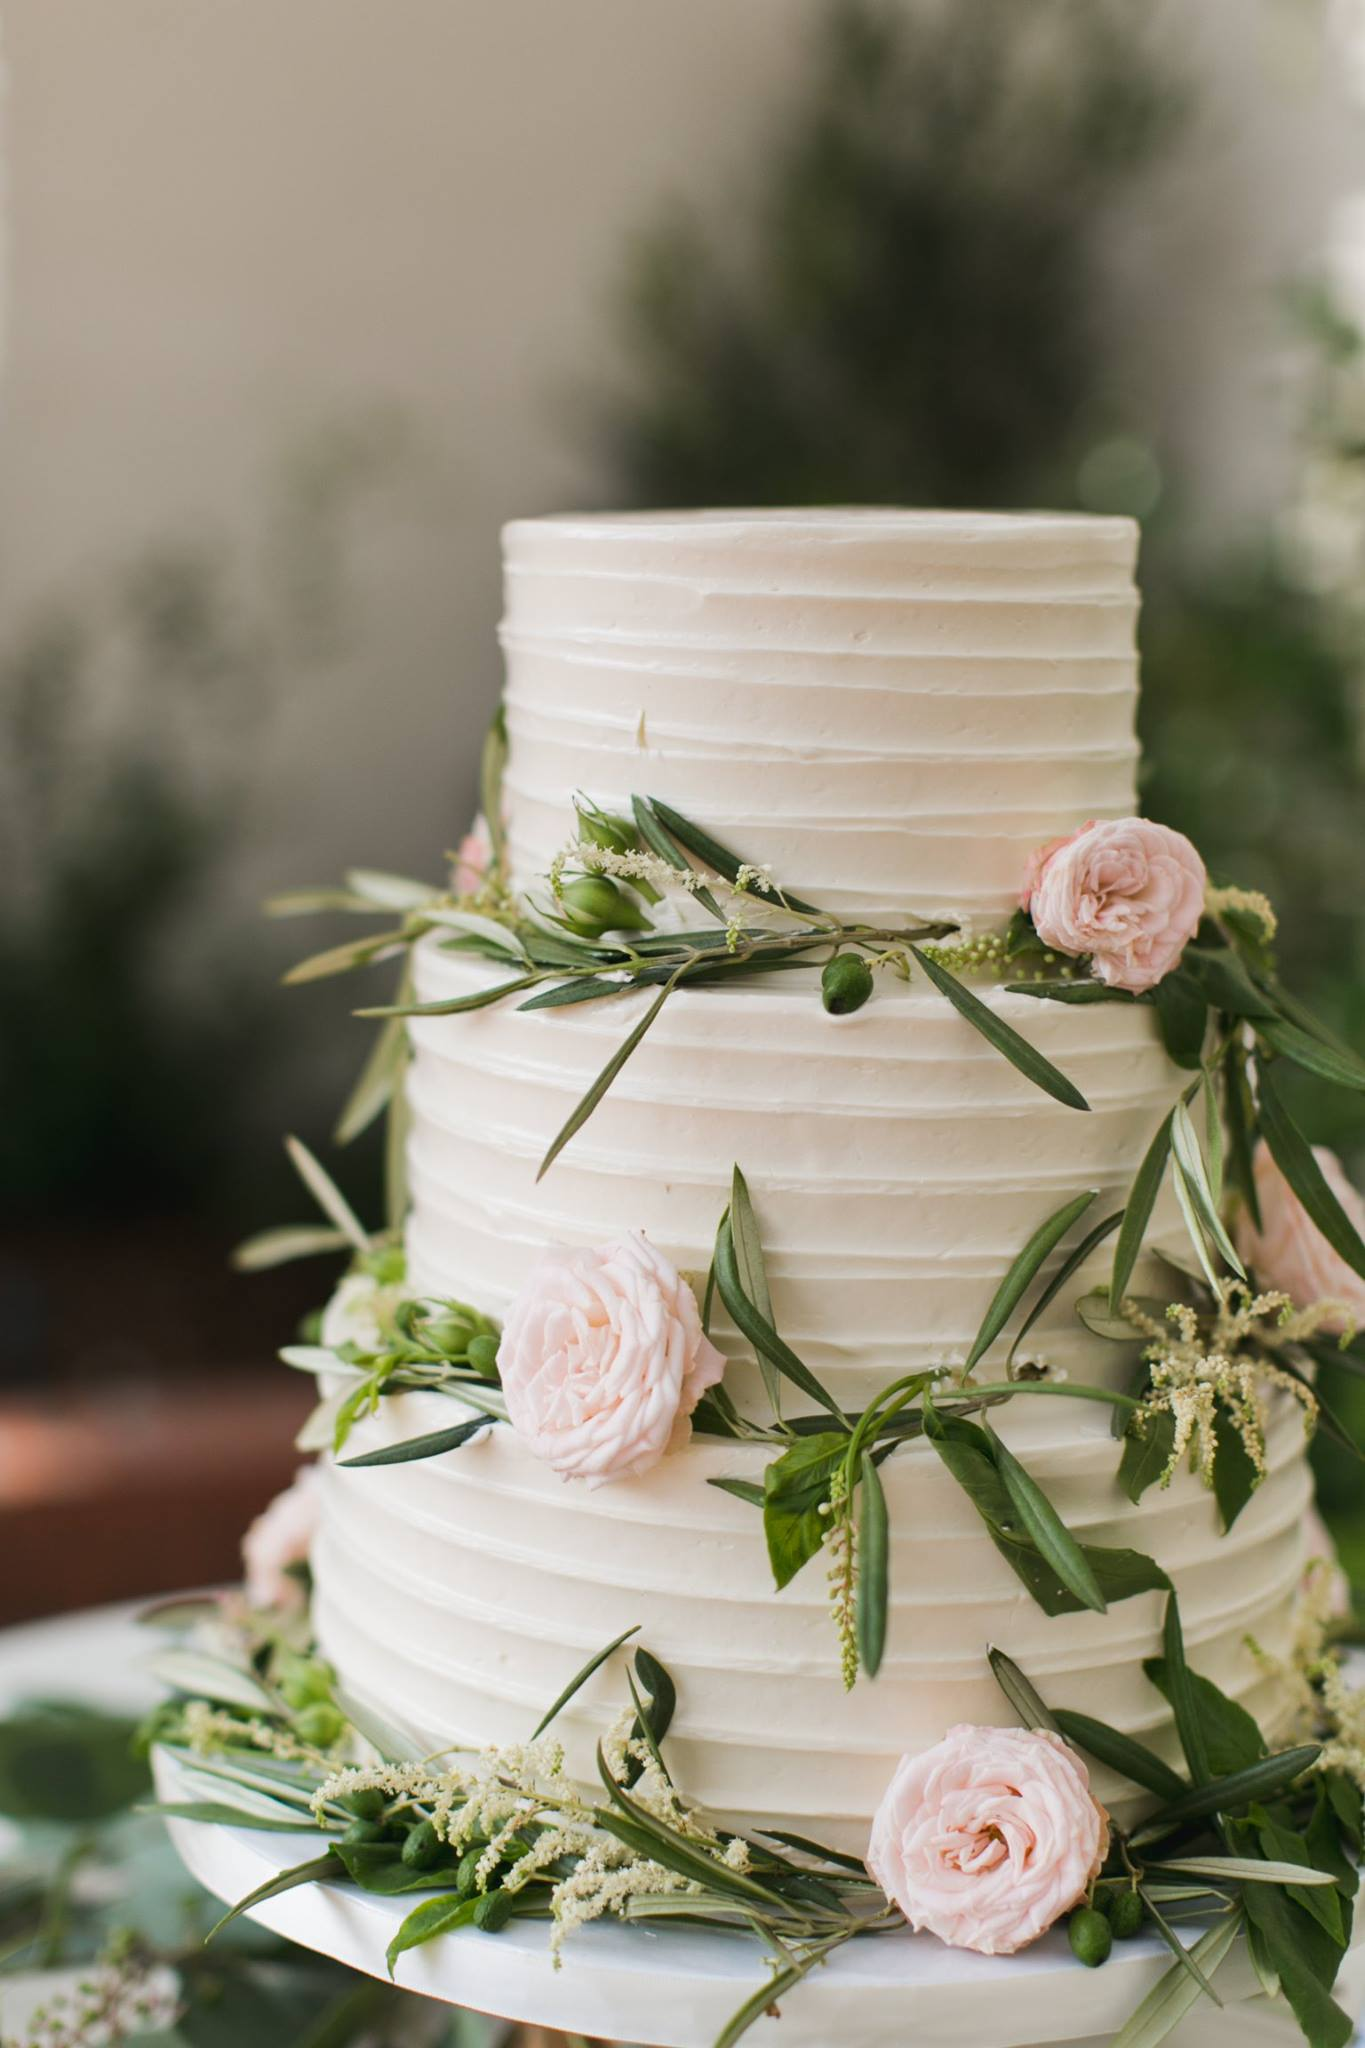 horizontal-texture-wedding-cake-greenery-sweet-cheeks-the-flower-shoppe-first-orange-photo-at-darlington-house